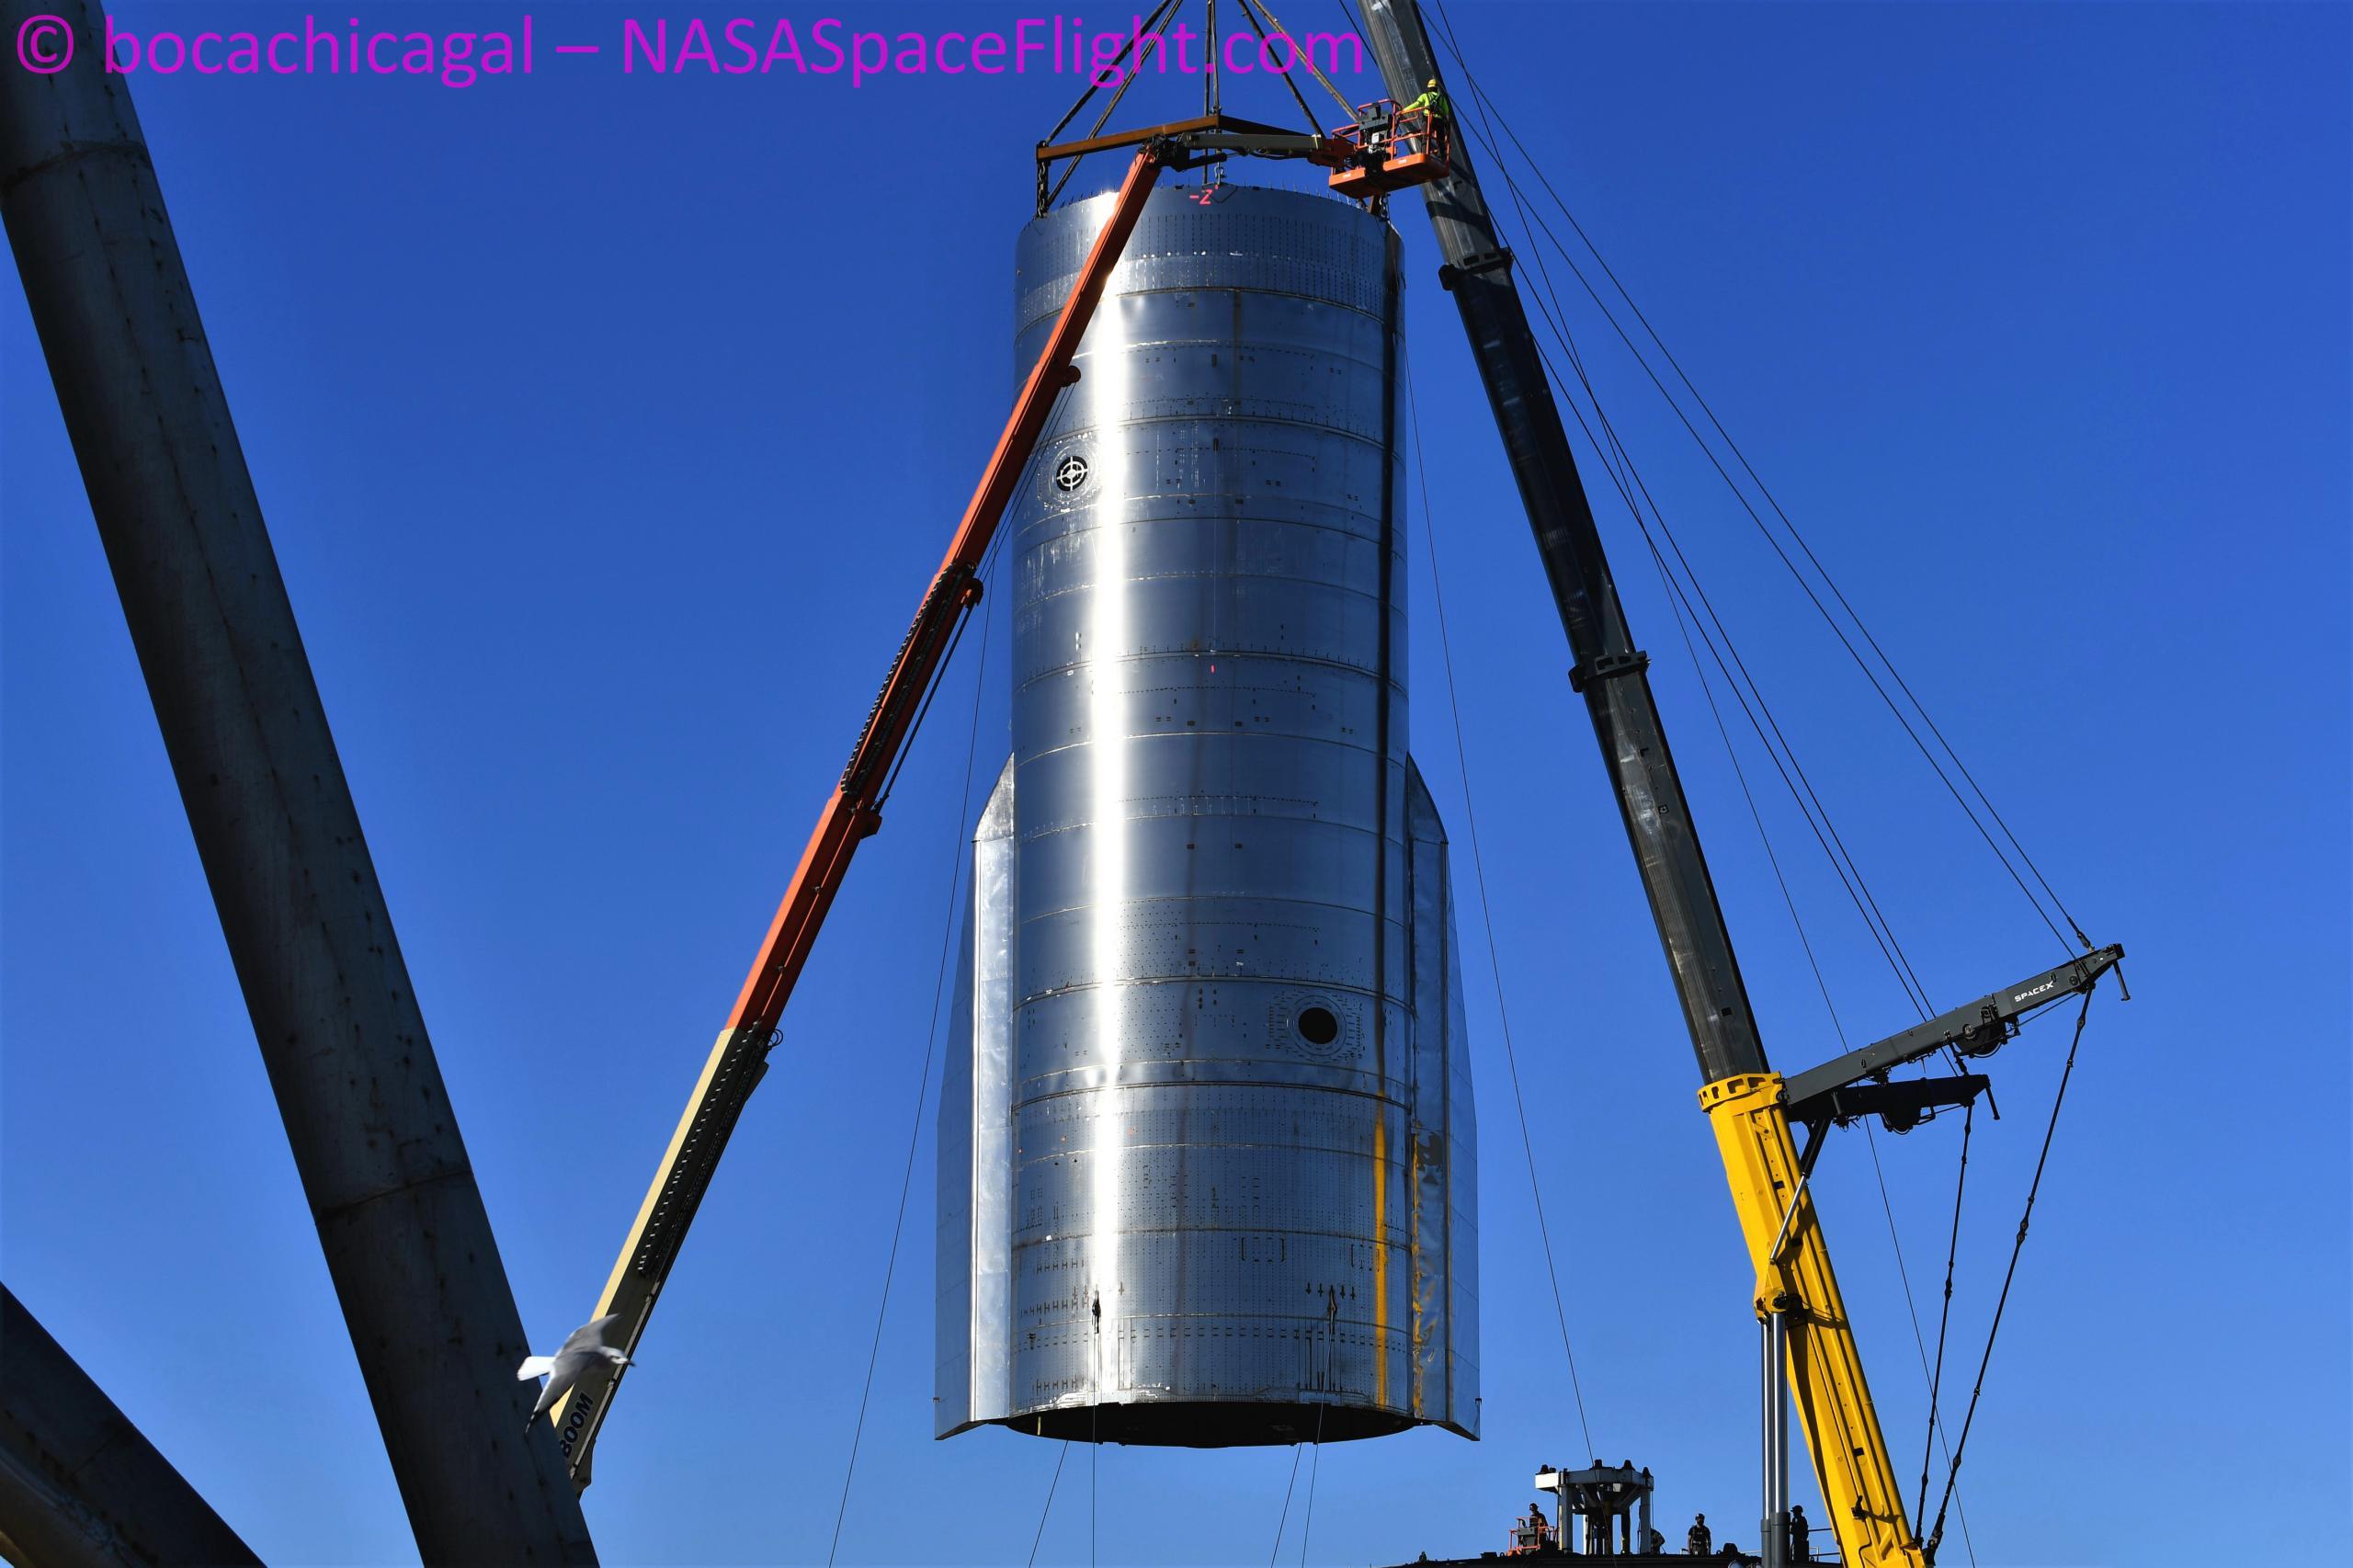 Starship Boca Chica 093020 (NASASpaceflight – bocachicagal) SN8 mount lift 9 (c)